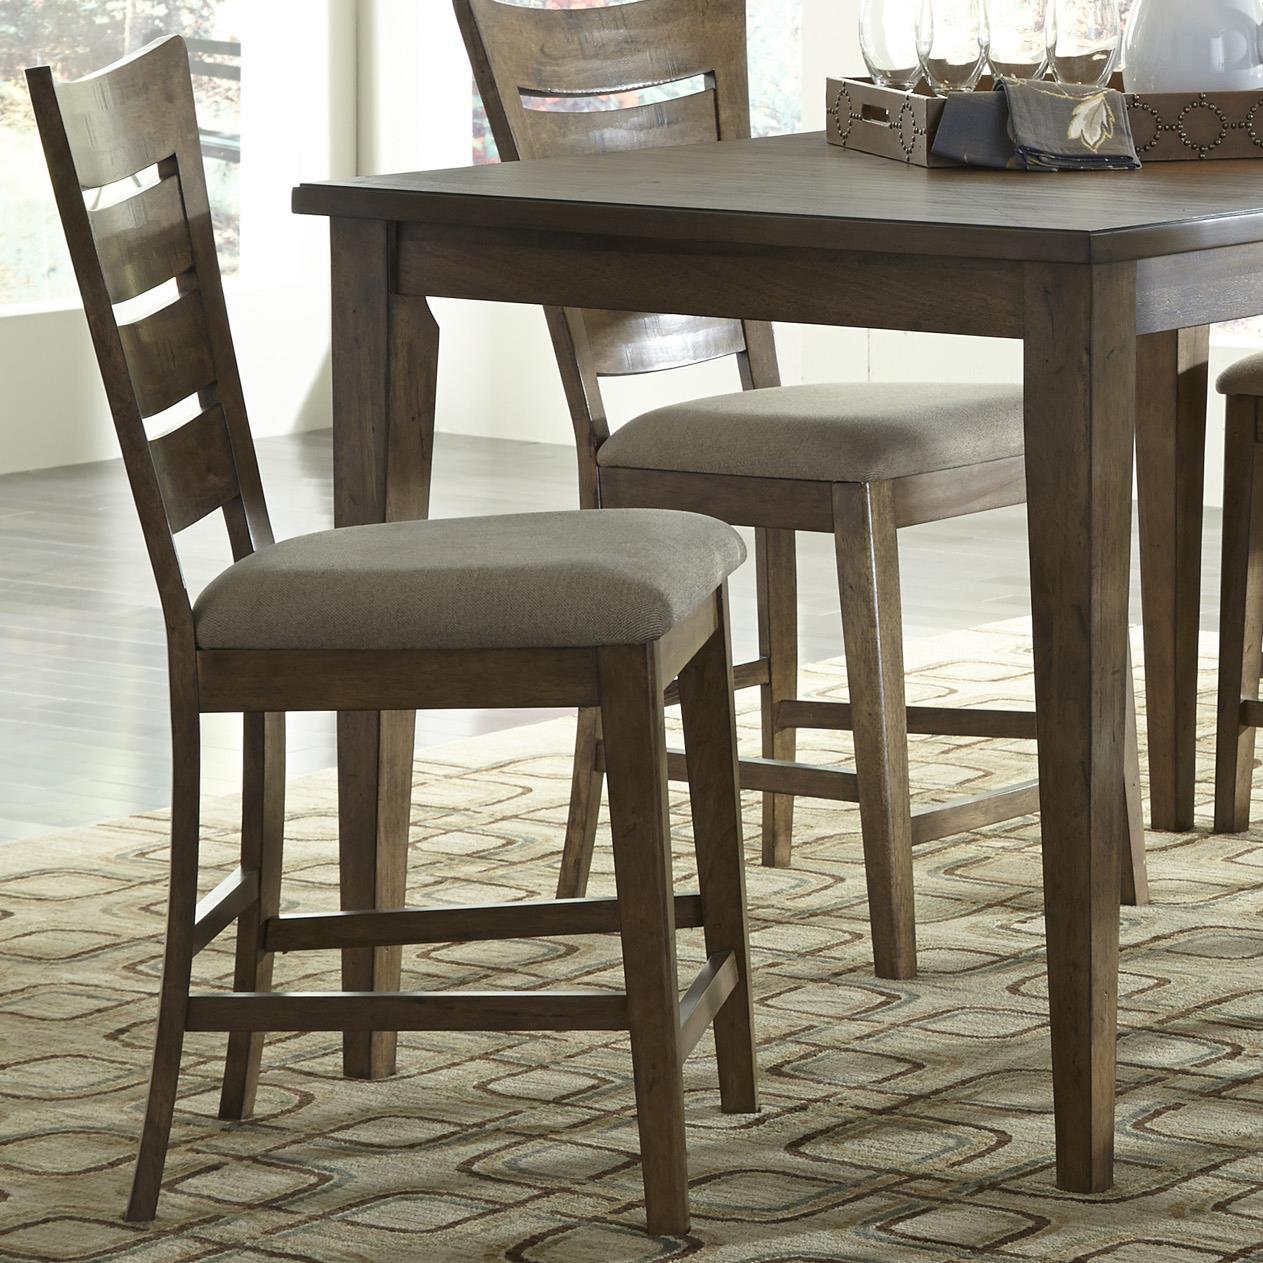 Vendor 5349 Pebble Creek Ladder Back Counter Chair - Item Number: 376-B200124